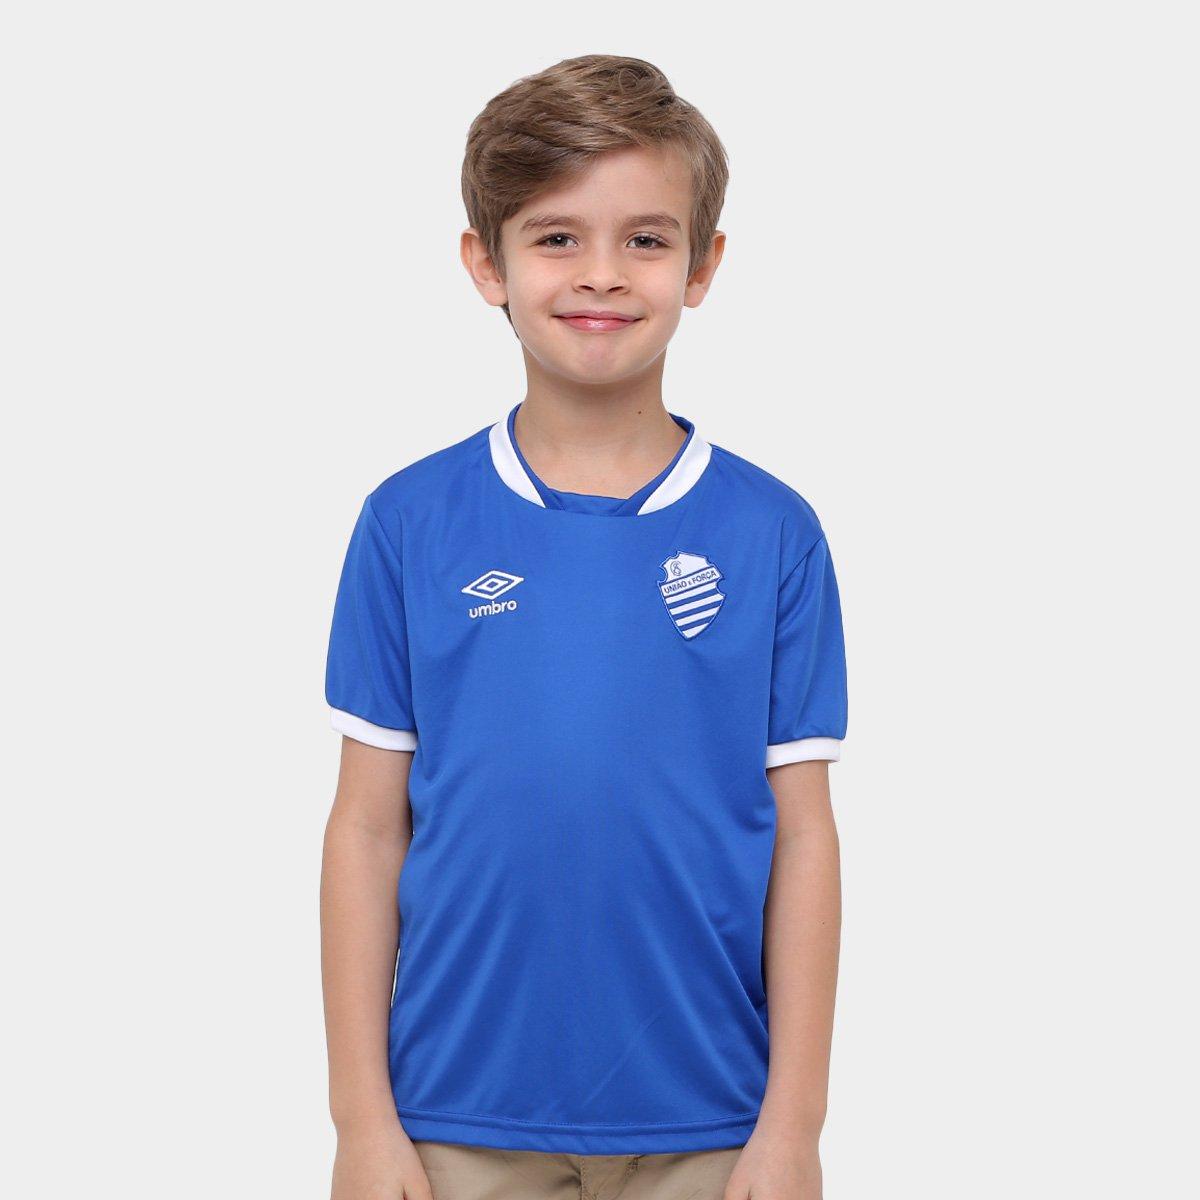 Camisa CSA Infantil I 2016 n° 10 - Torcedor Umbro 5da1808529173